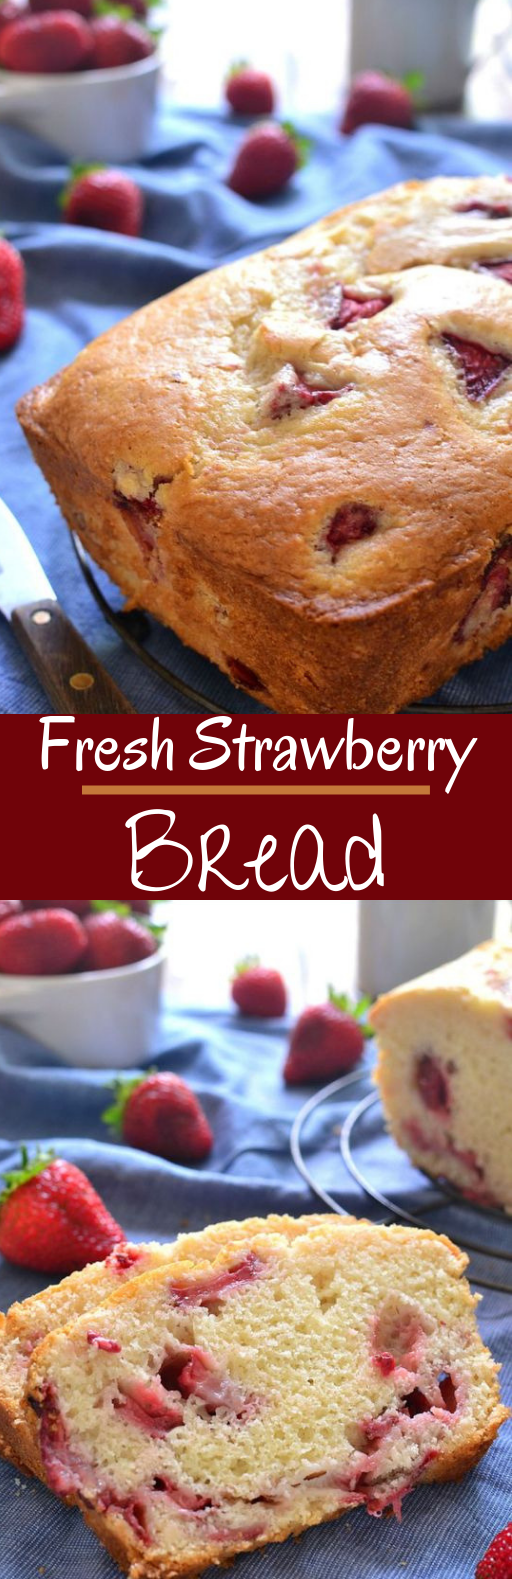 Fresh Strawberry Bread #cake #baking